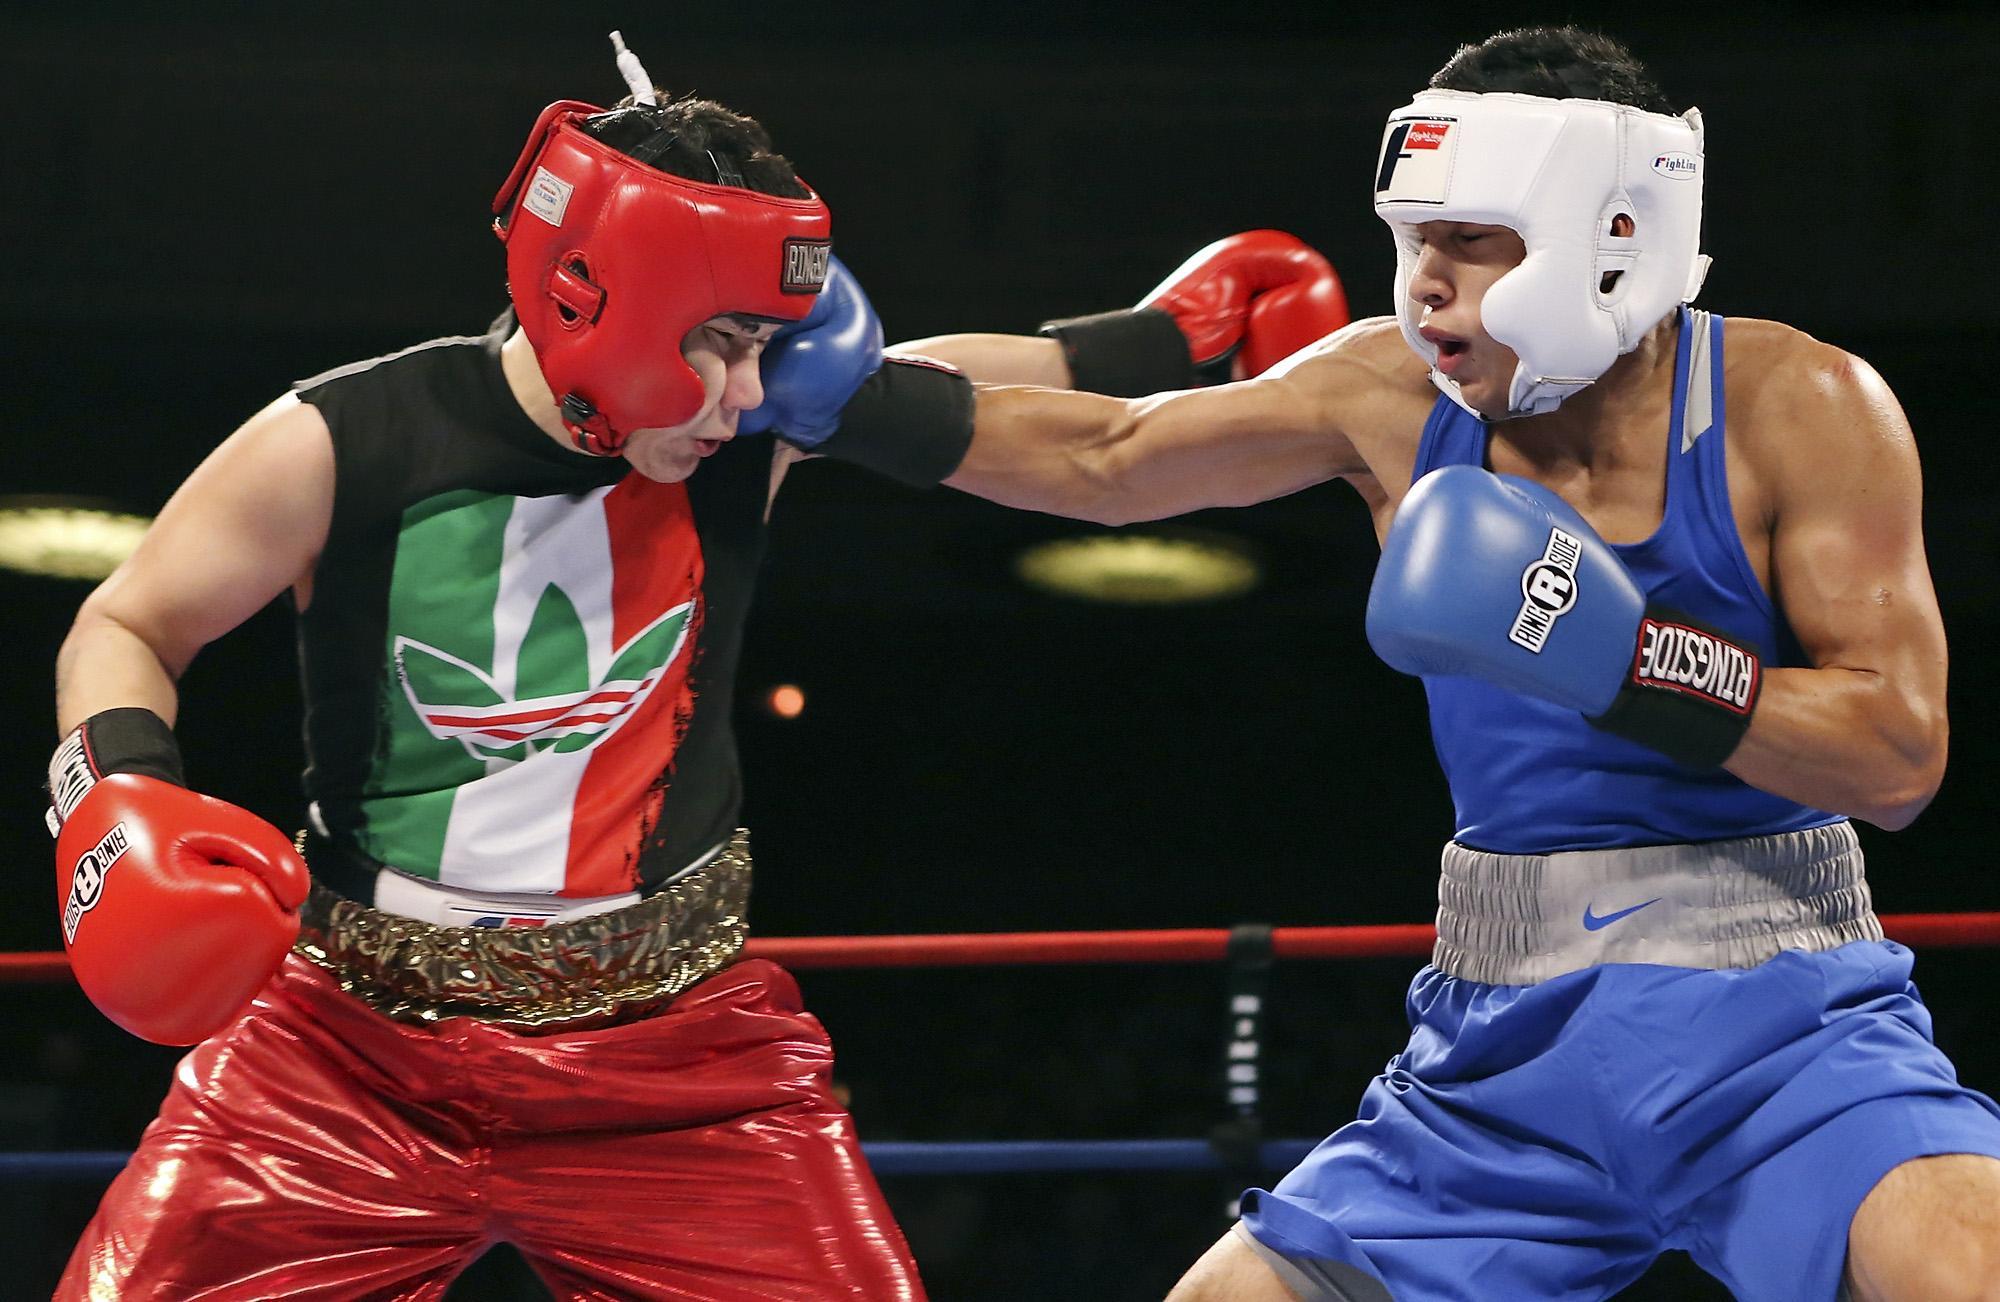 Kc golden gloves boxing tournament showcases local talent